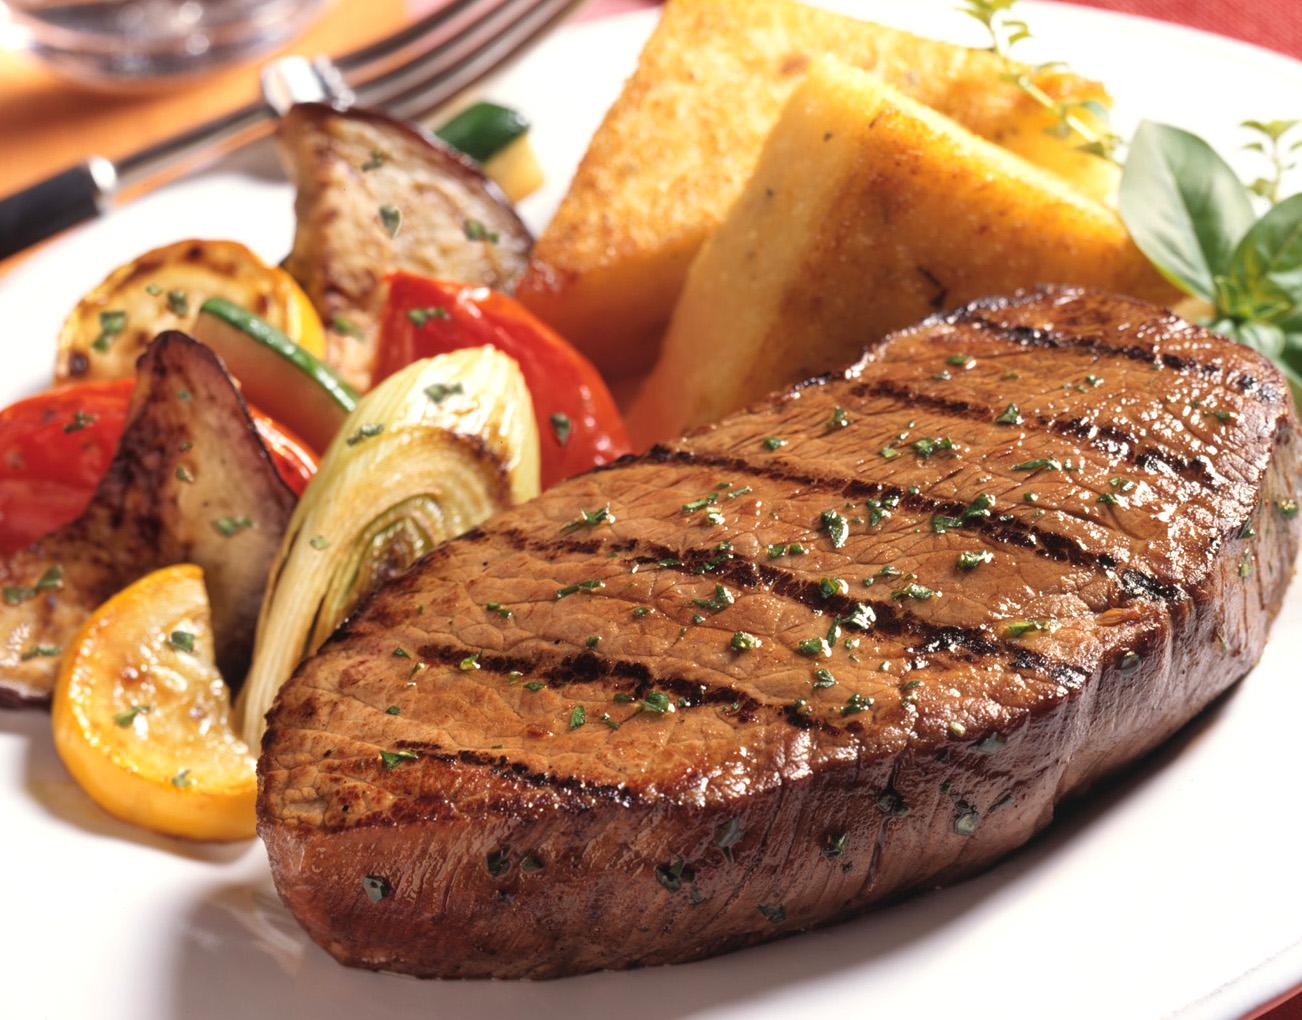 food_steak_desktop_1302x1020_wallpaper-420339